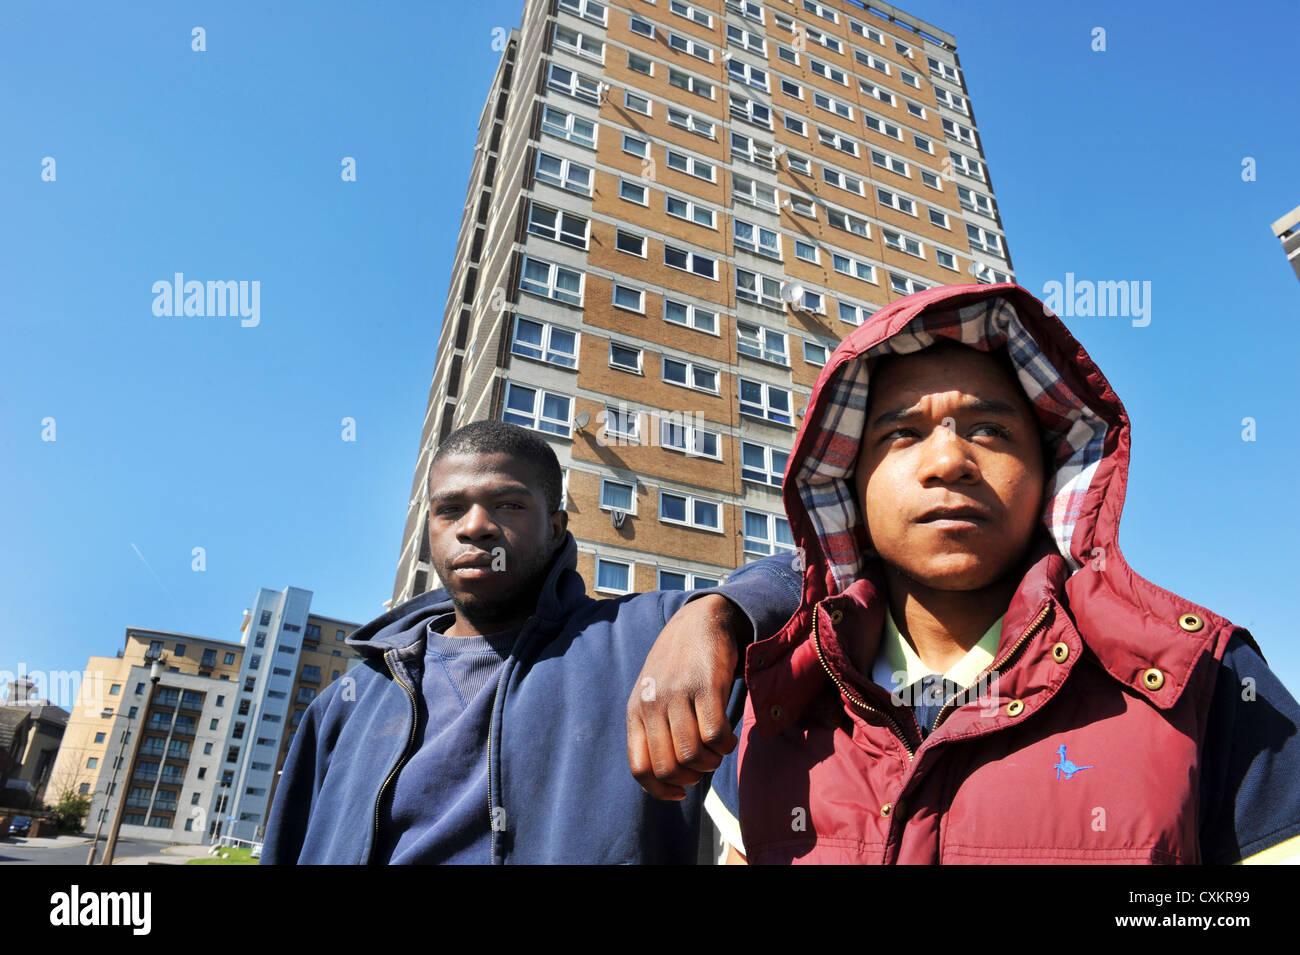 Junge Arbeitslose Jugendliche Leeds UK Stockfoto